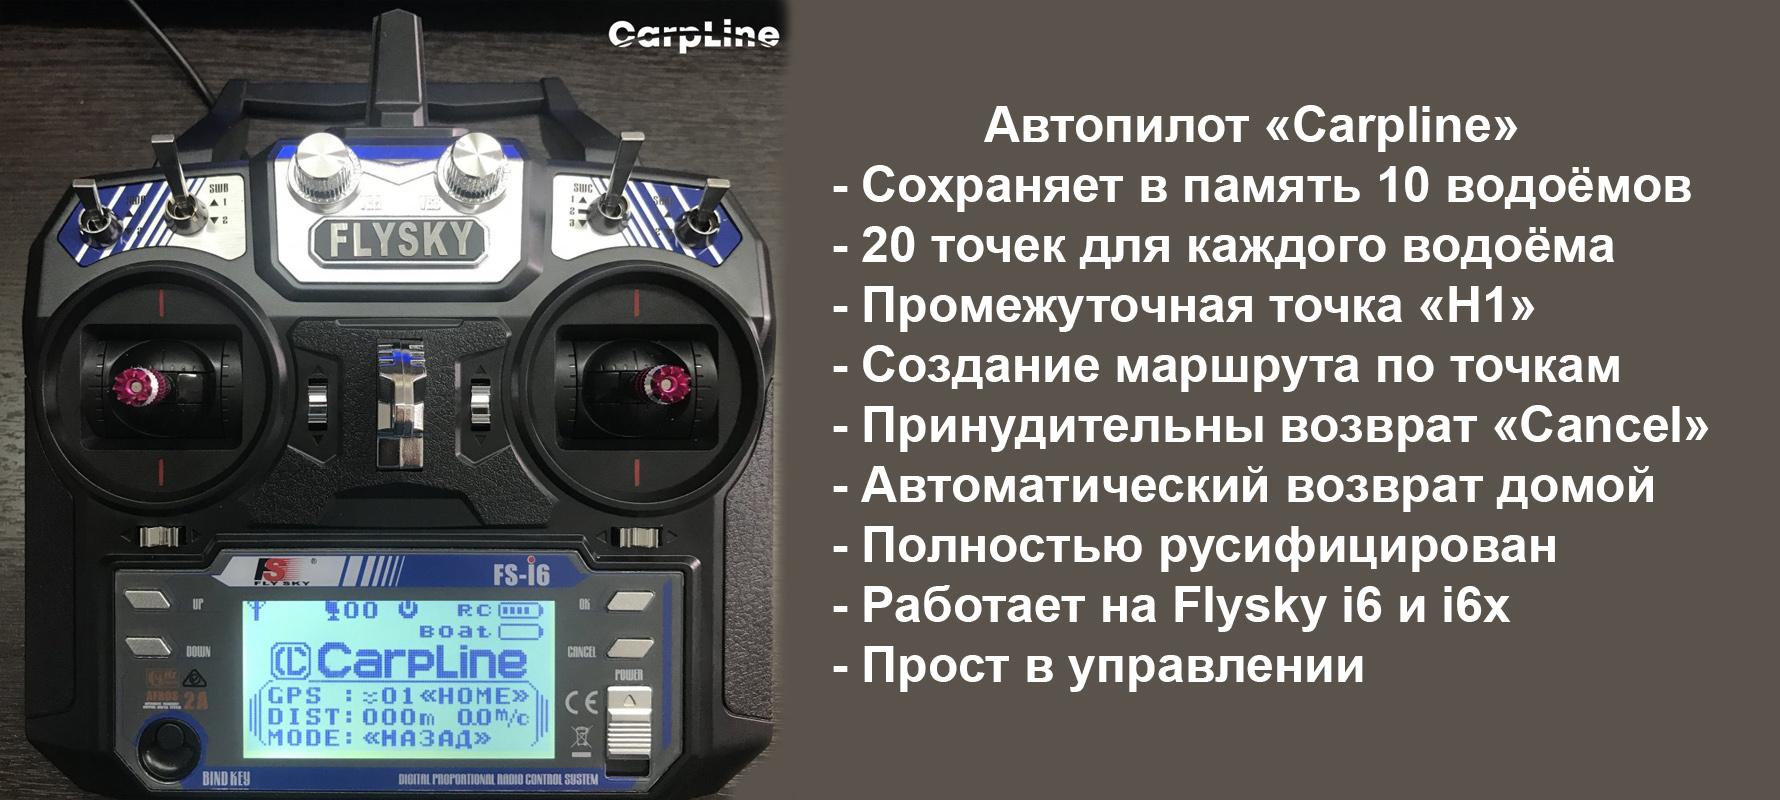 Автопилот Carpline для прикормочного кораблика